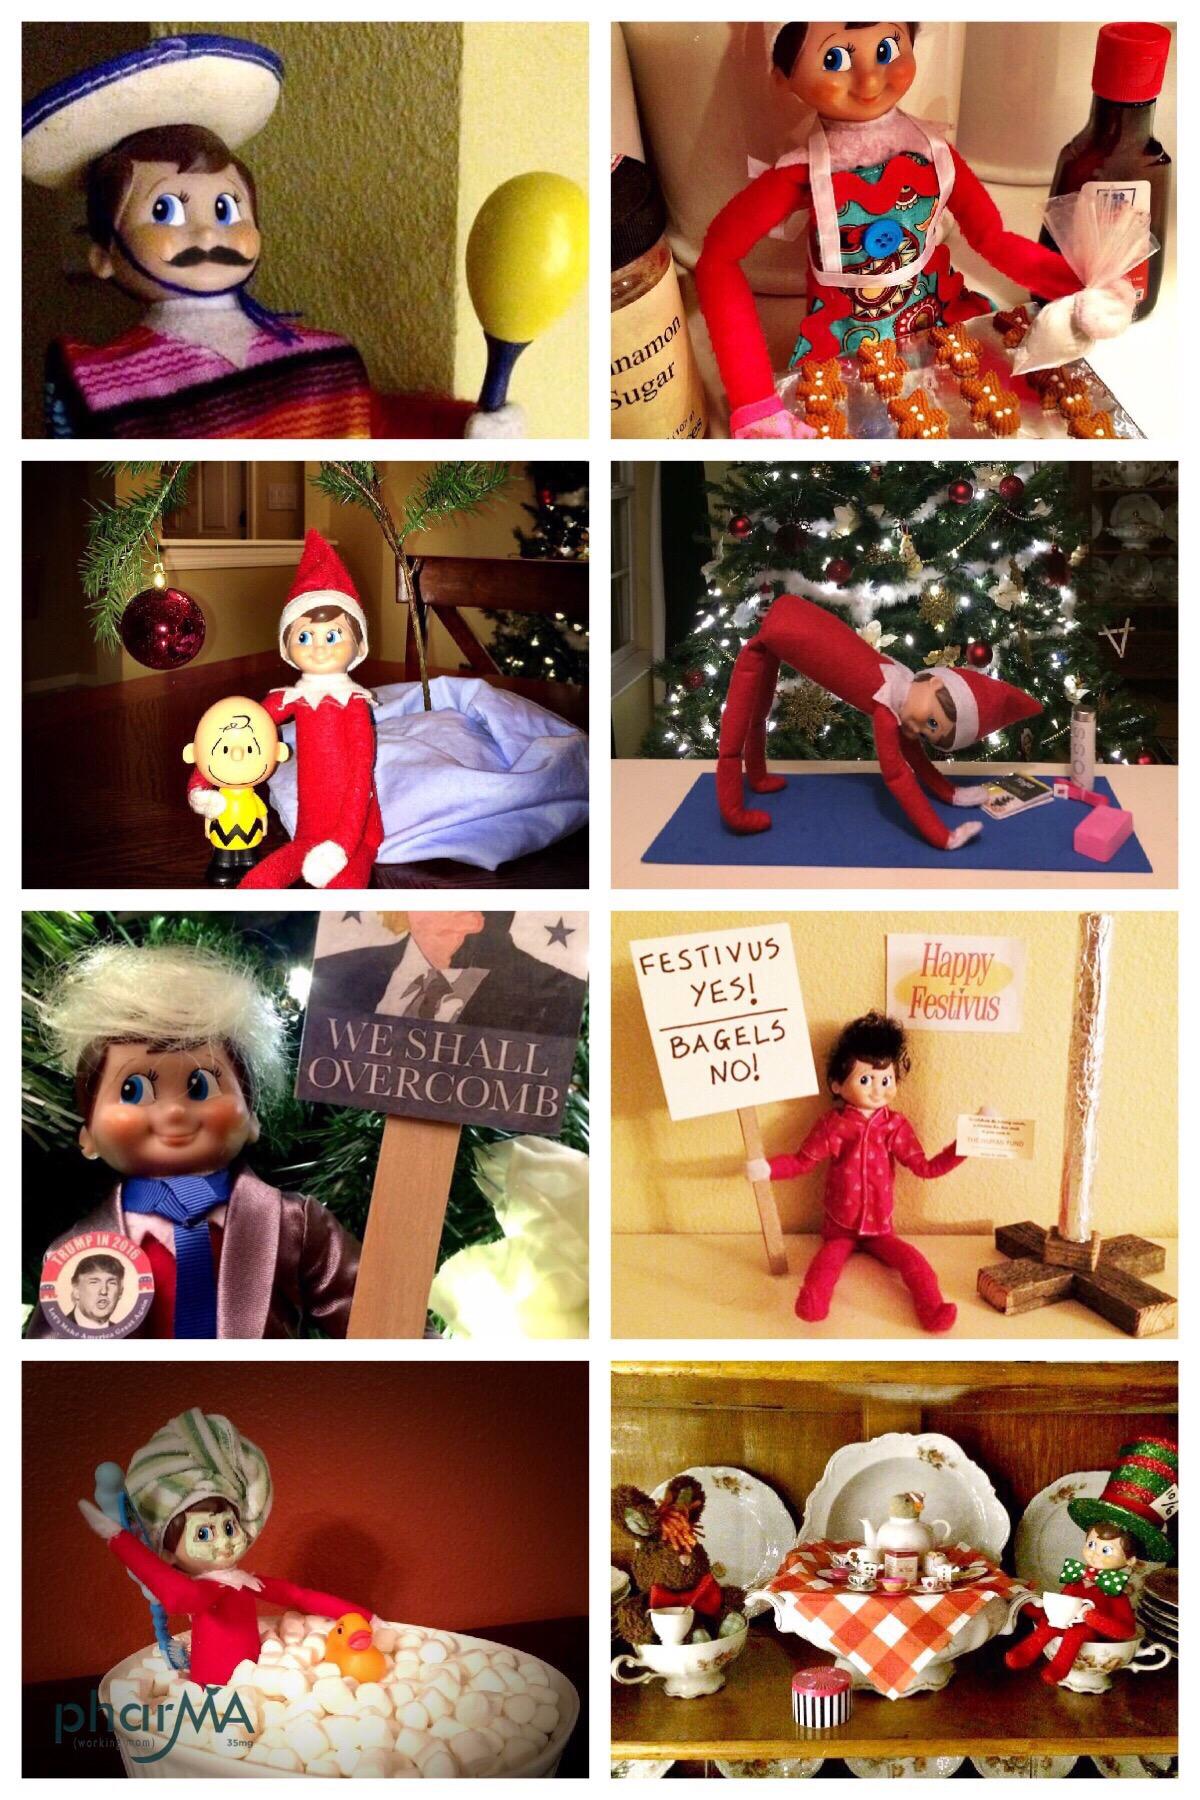 #elfwars, #elfwars2016, Elf on the Shelf Ideas, Jingle, Sparkle